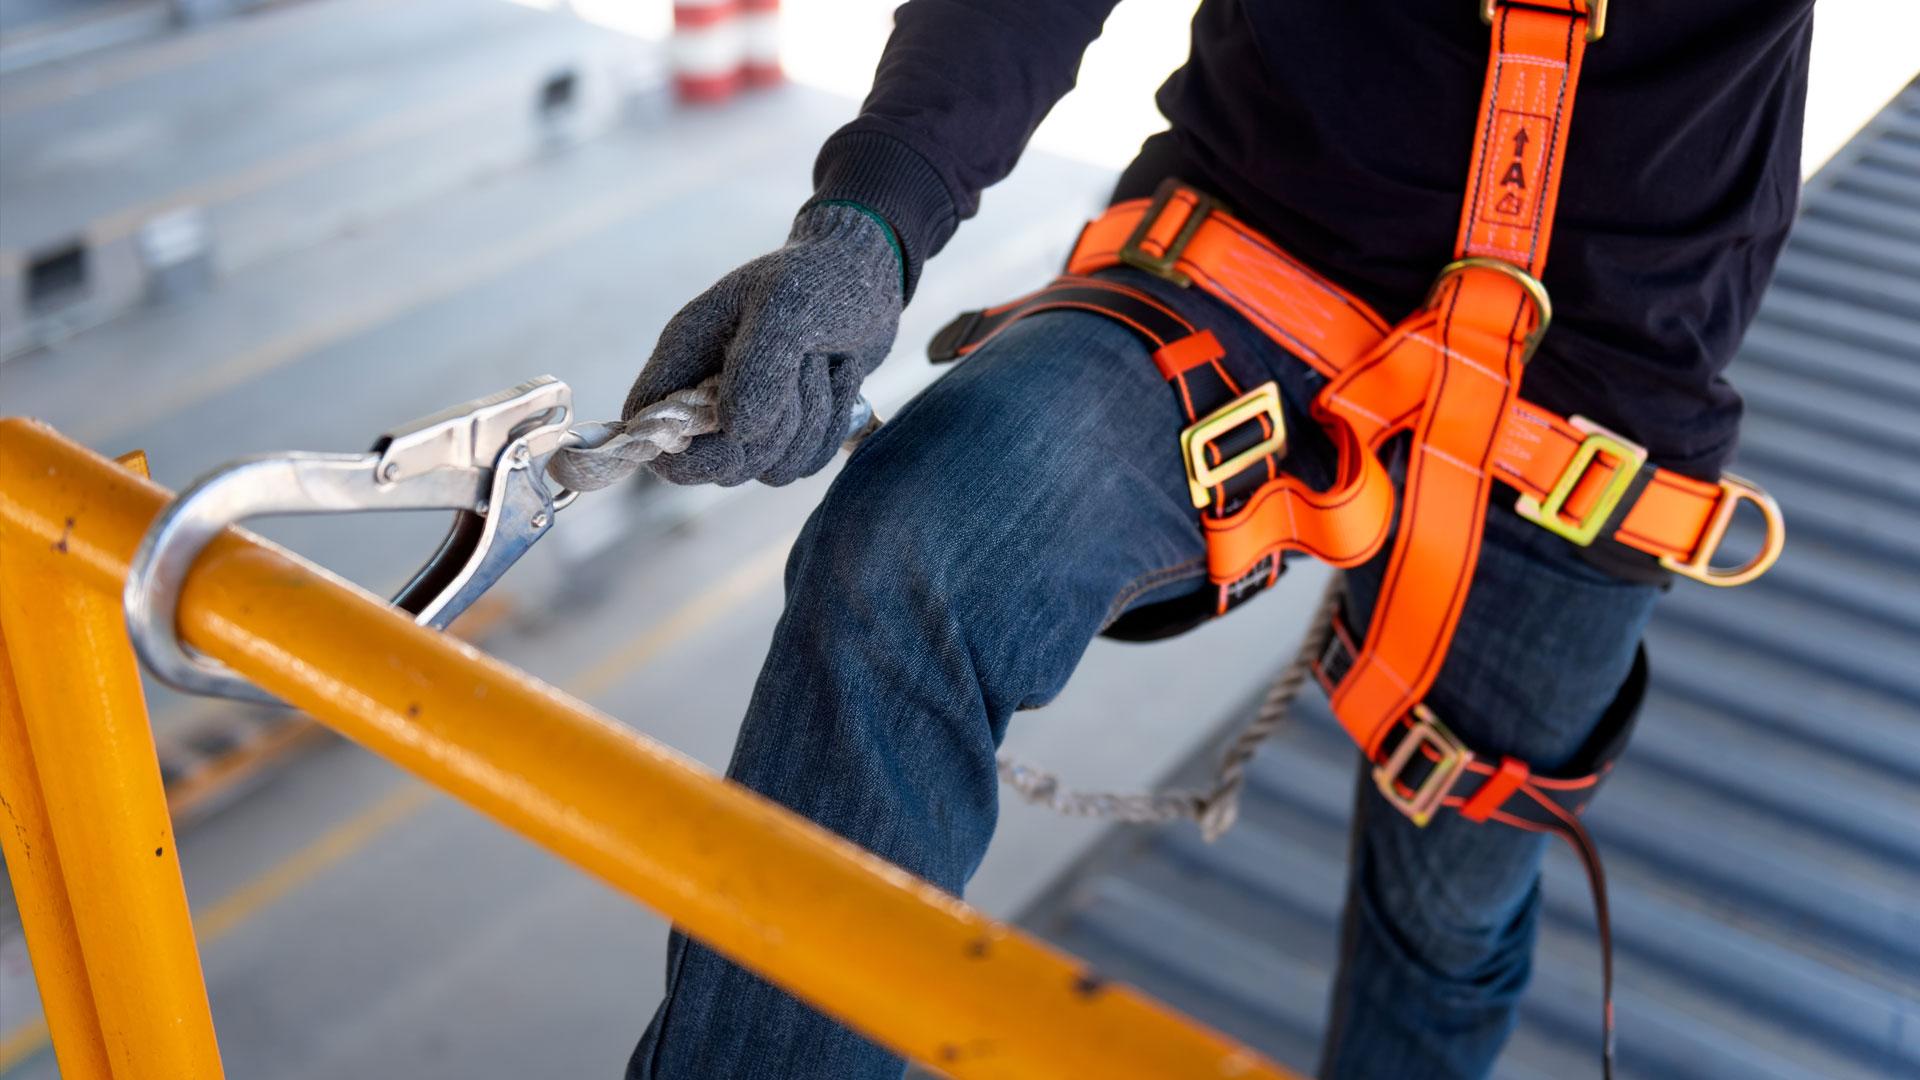 Millwright Safety